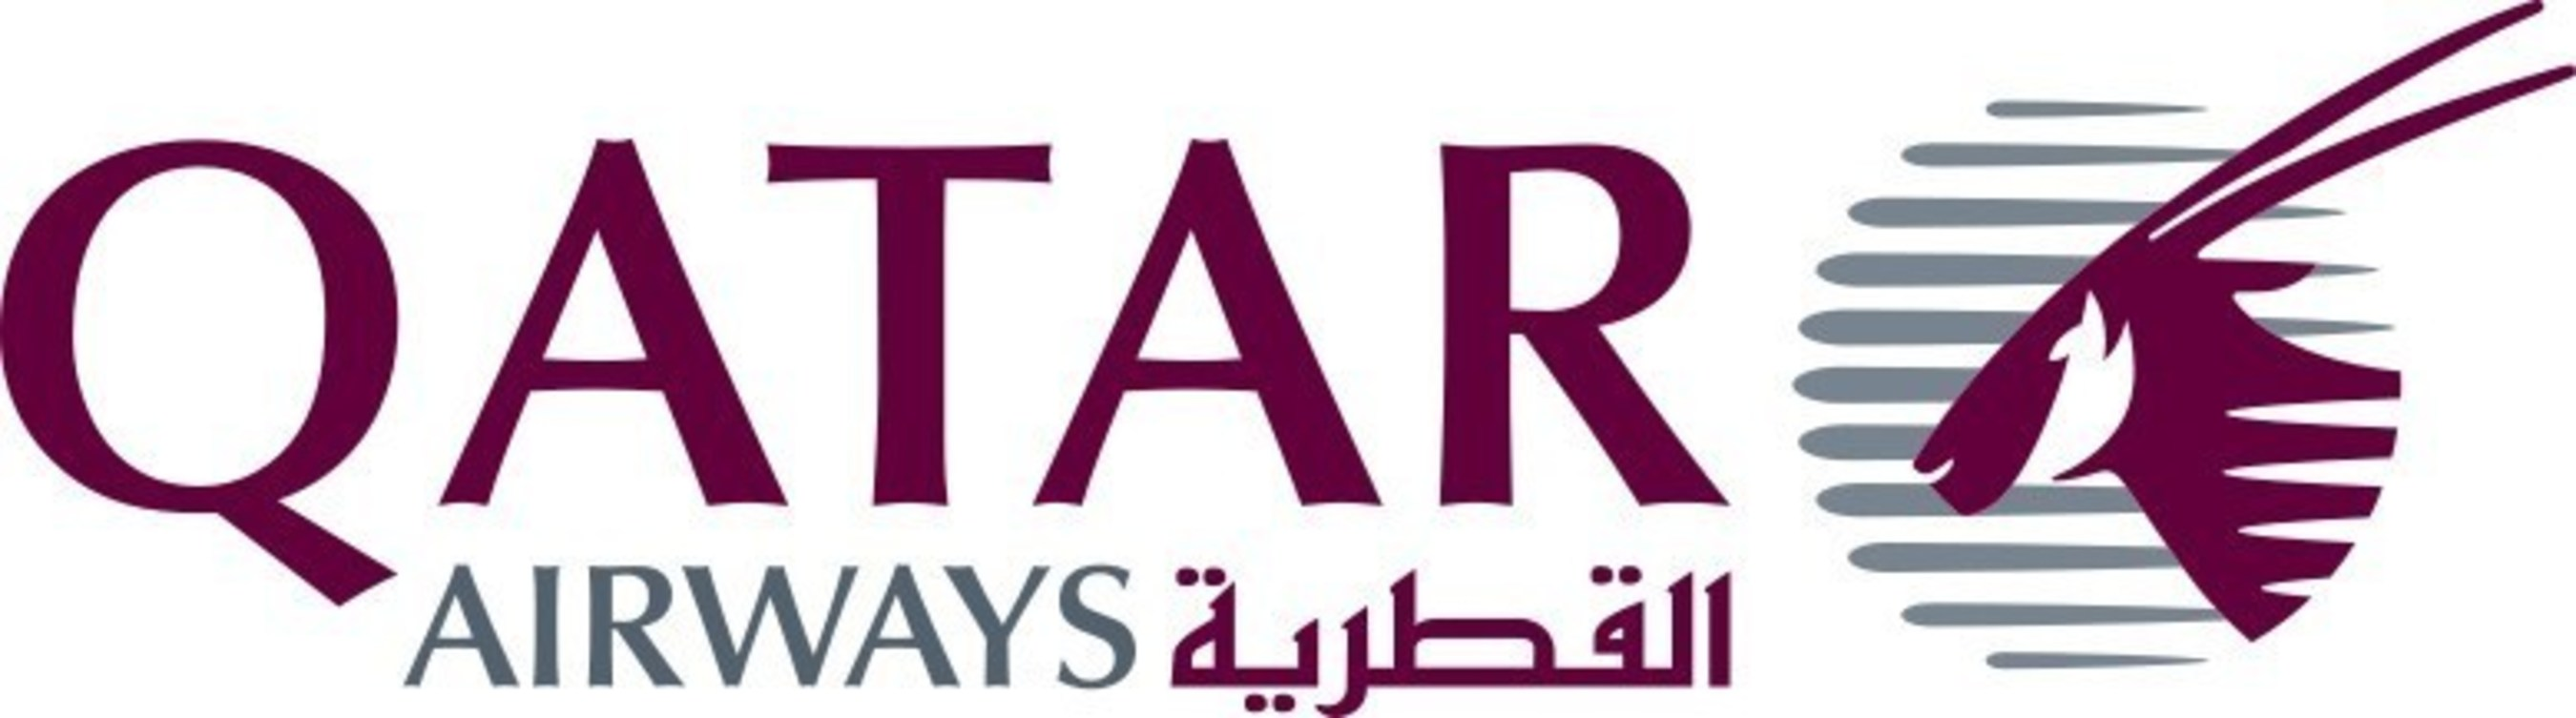 Qatar Airways Logo (PRNewsFoto/Qatar Airways)